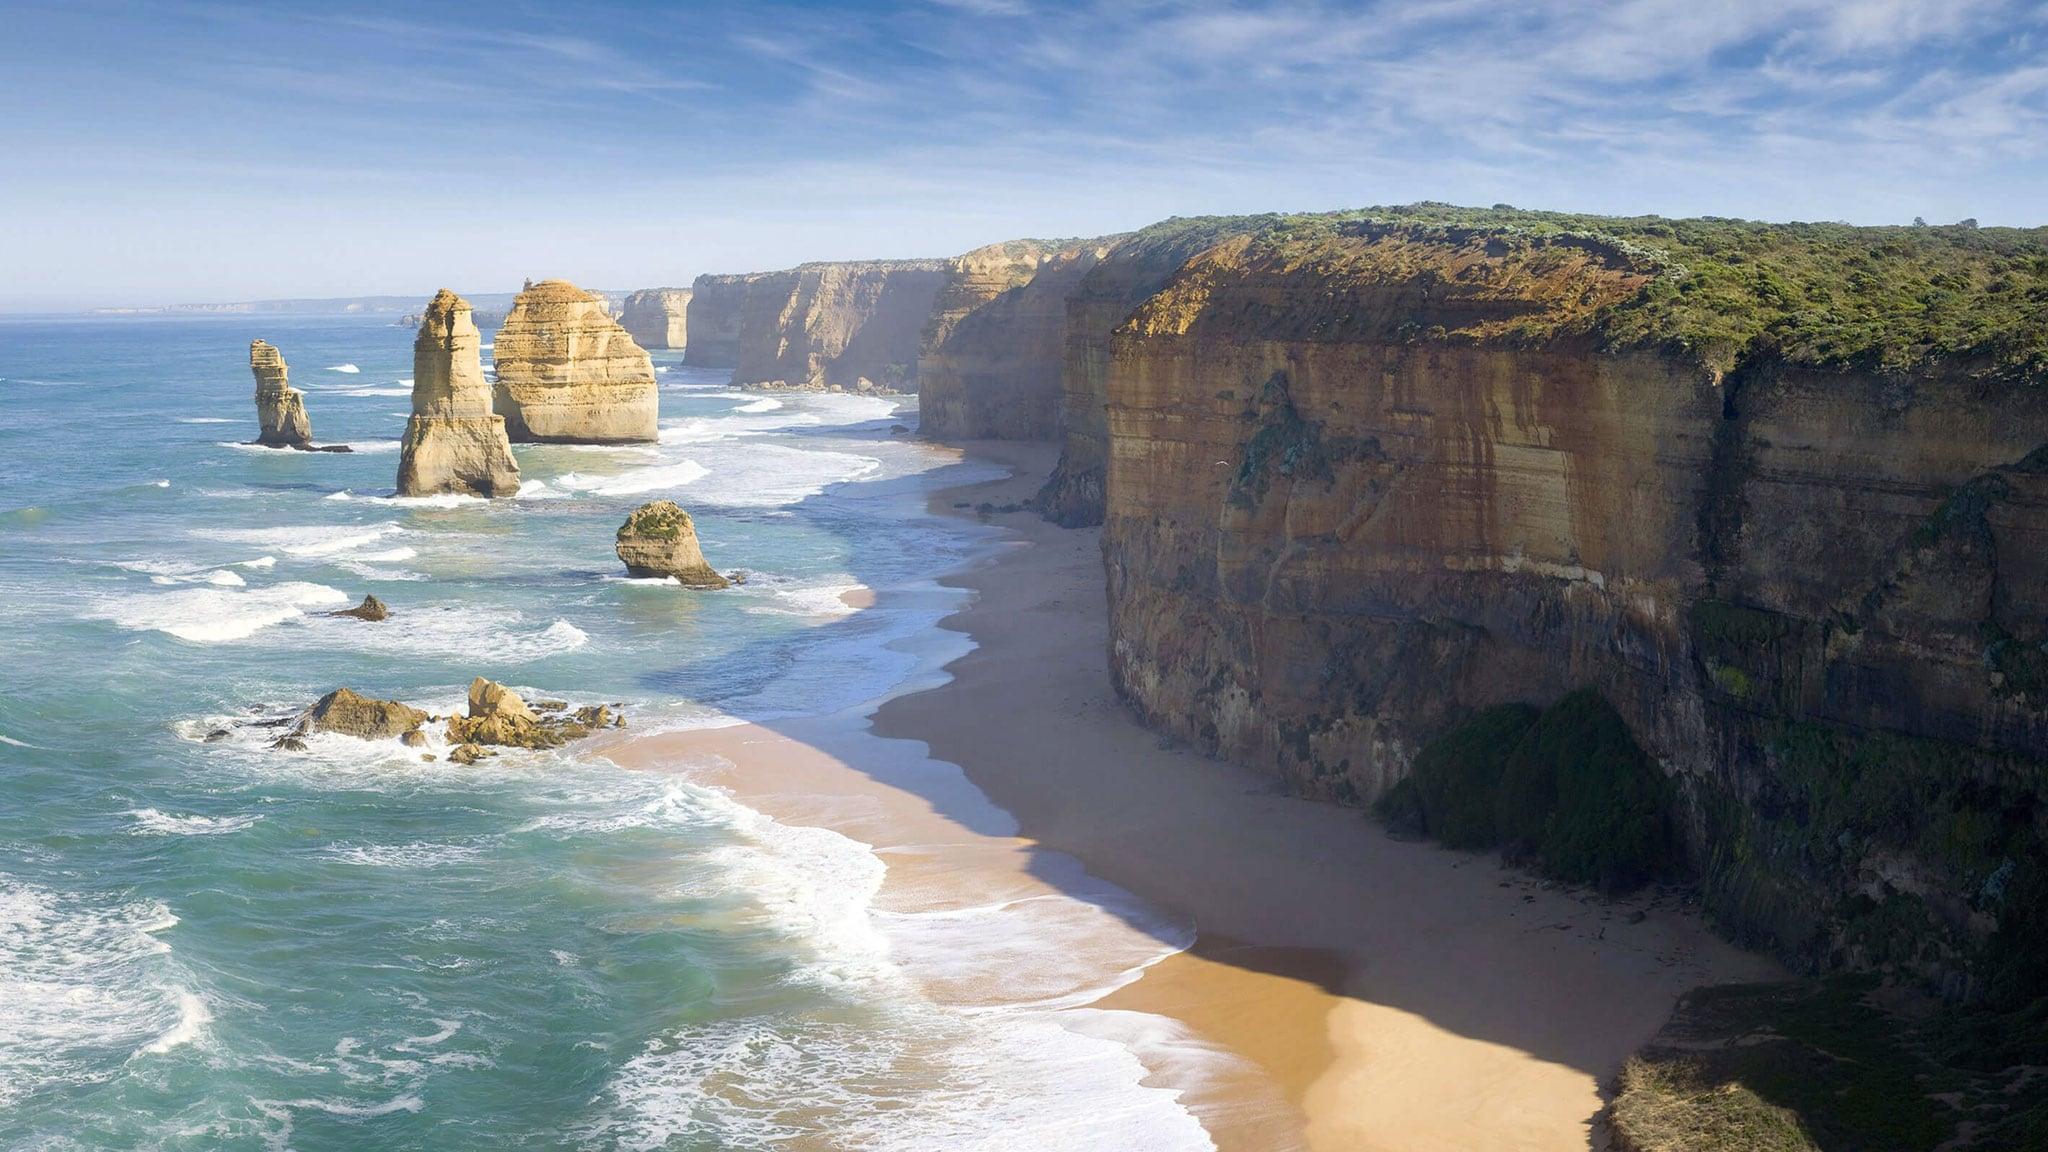 stasera in tv COAST AUSTRALIA, oggi in tv prima serata COAST AUSTRALIA